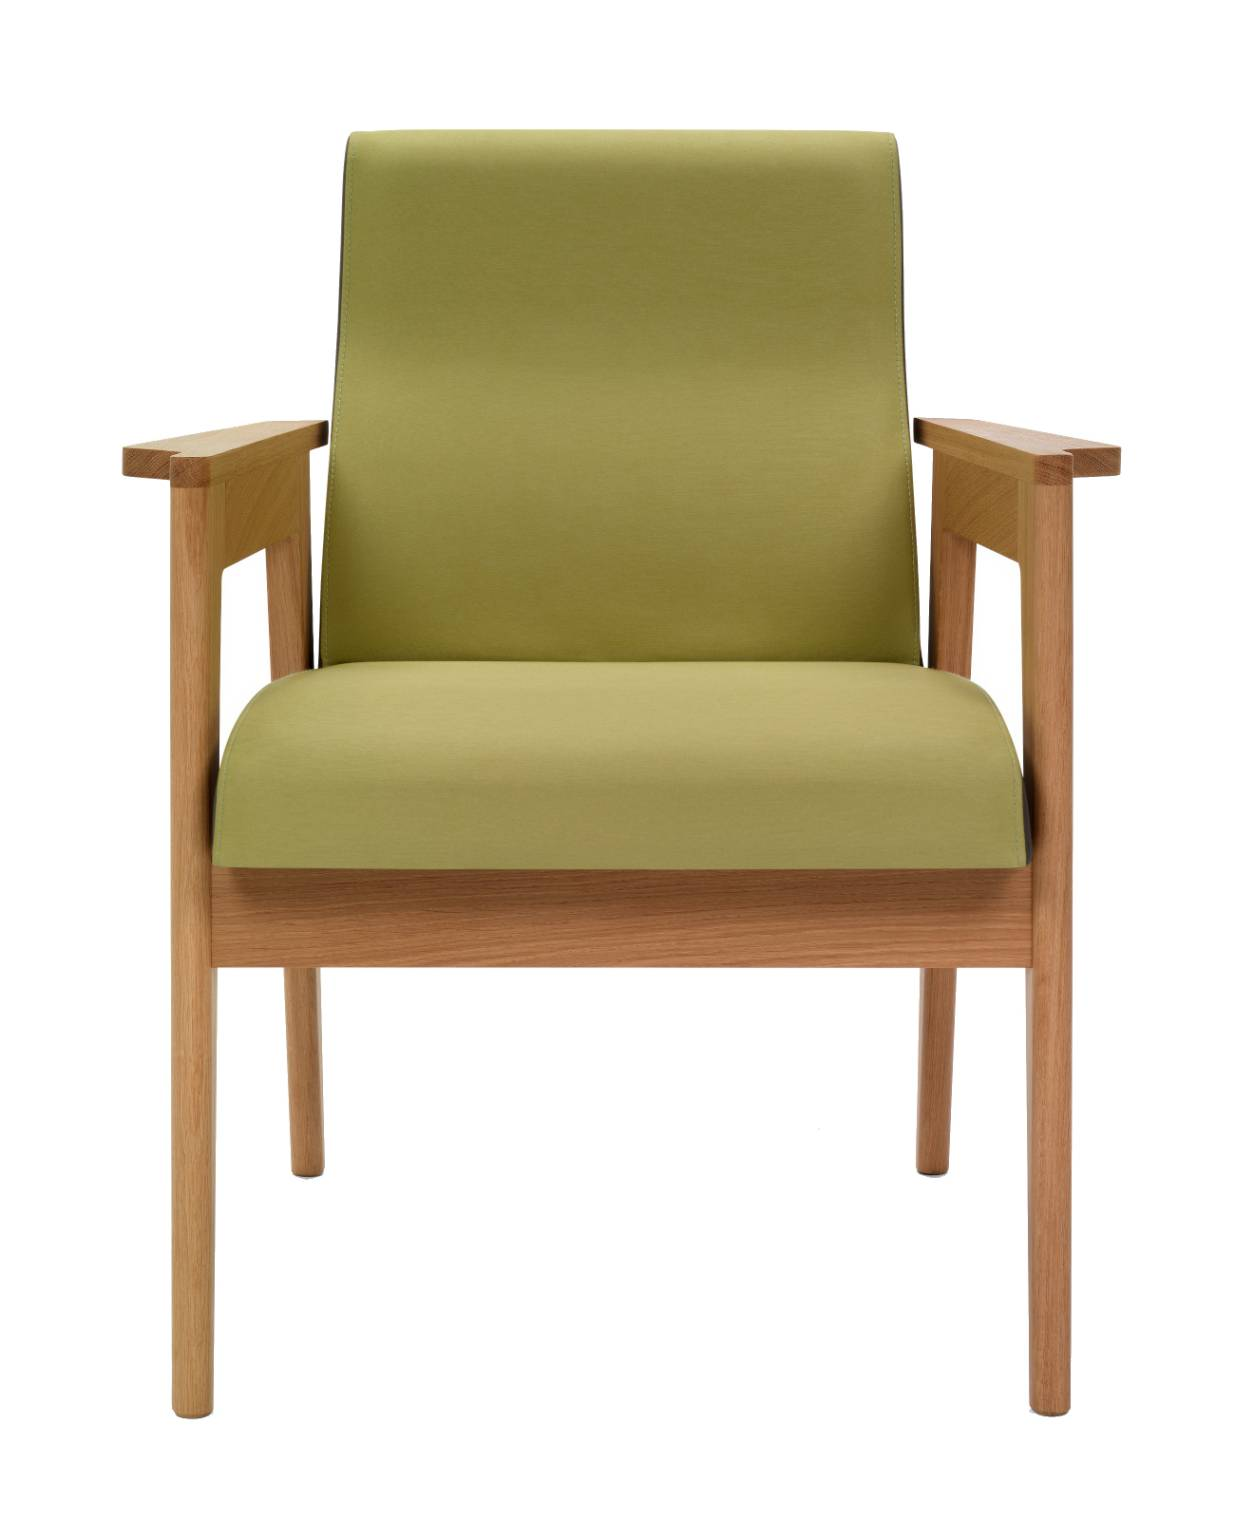 Mobles114 Danesa Armlehnstuhl Design Möbel